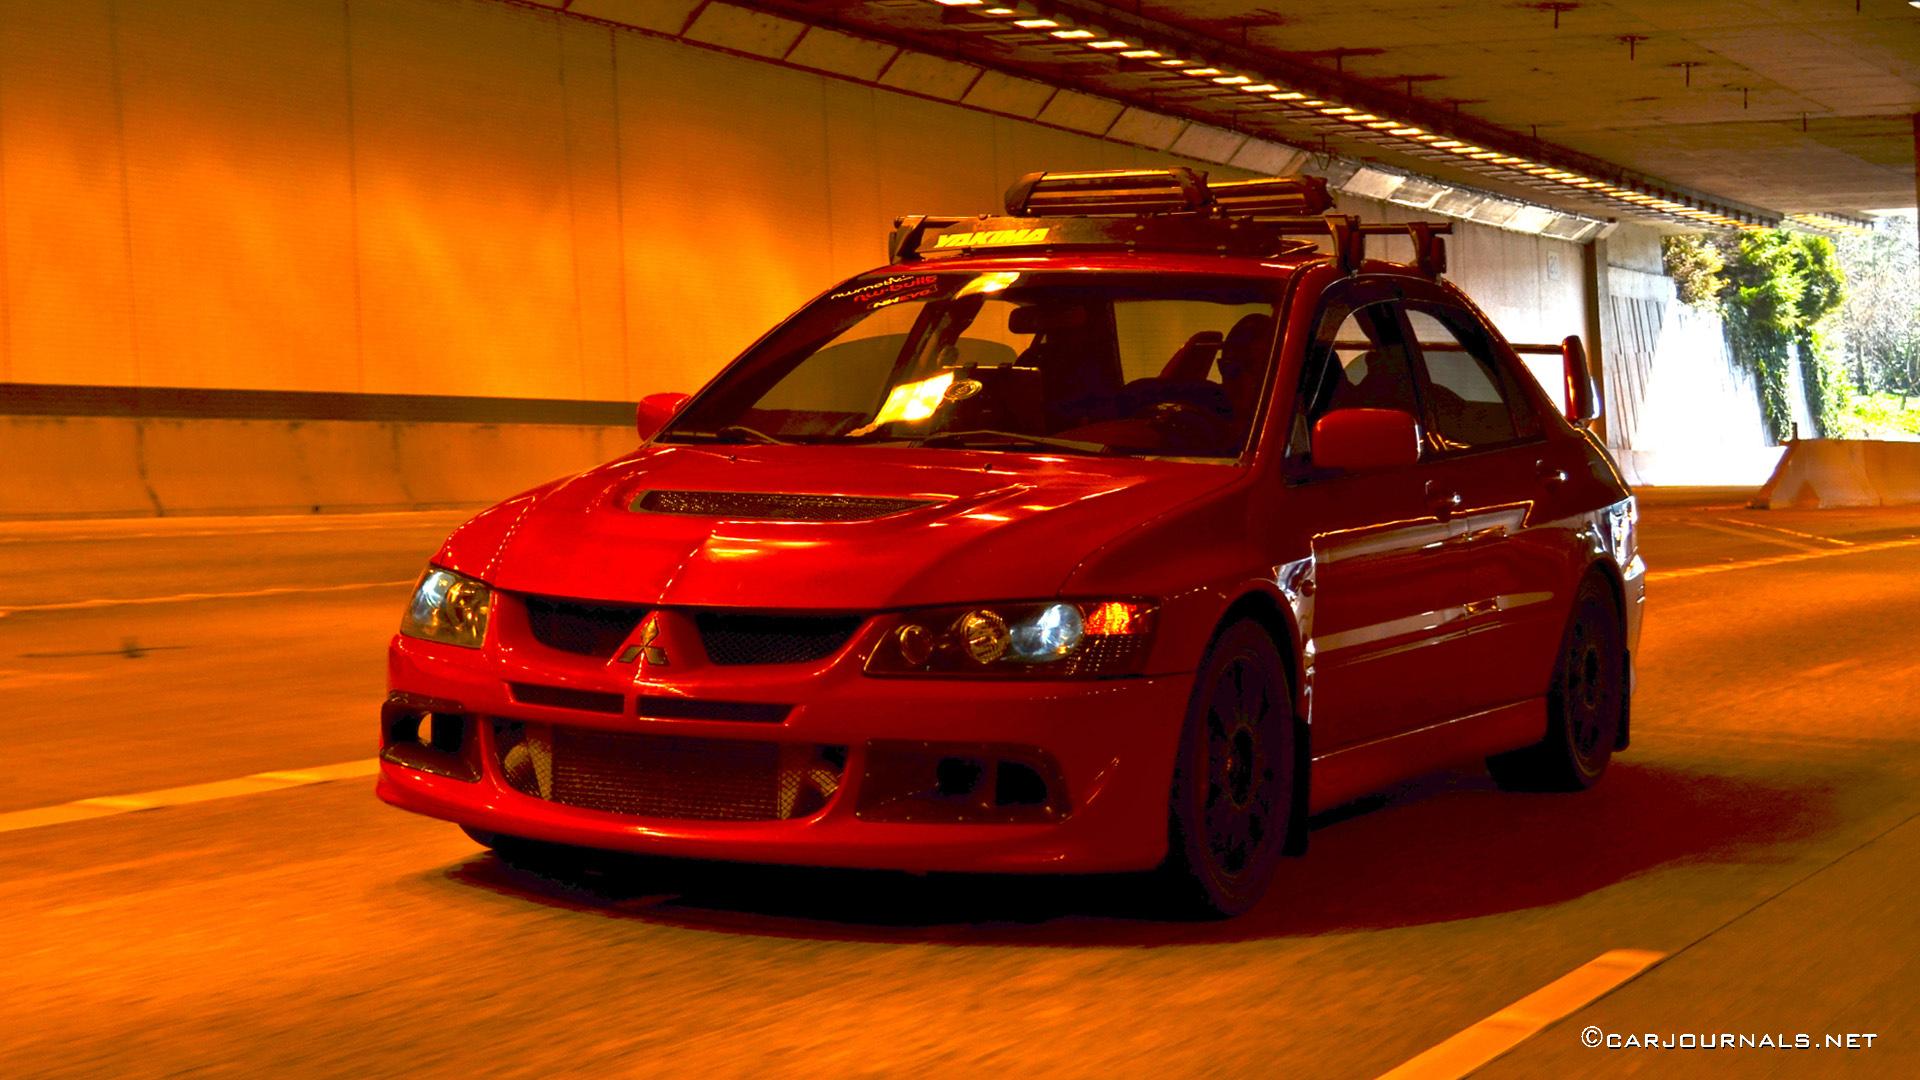 Hd Car Wallpapers Mitsubishi Evo Viii Car Journals